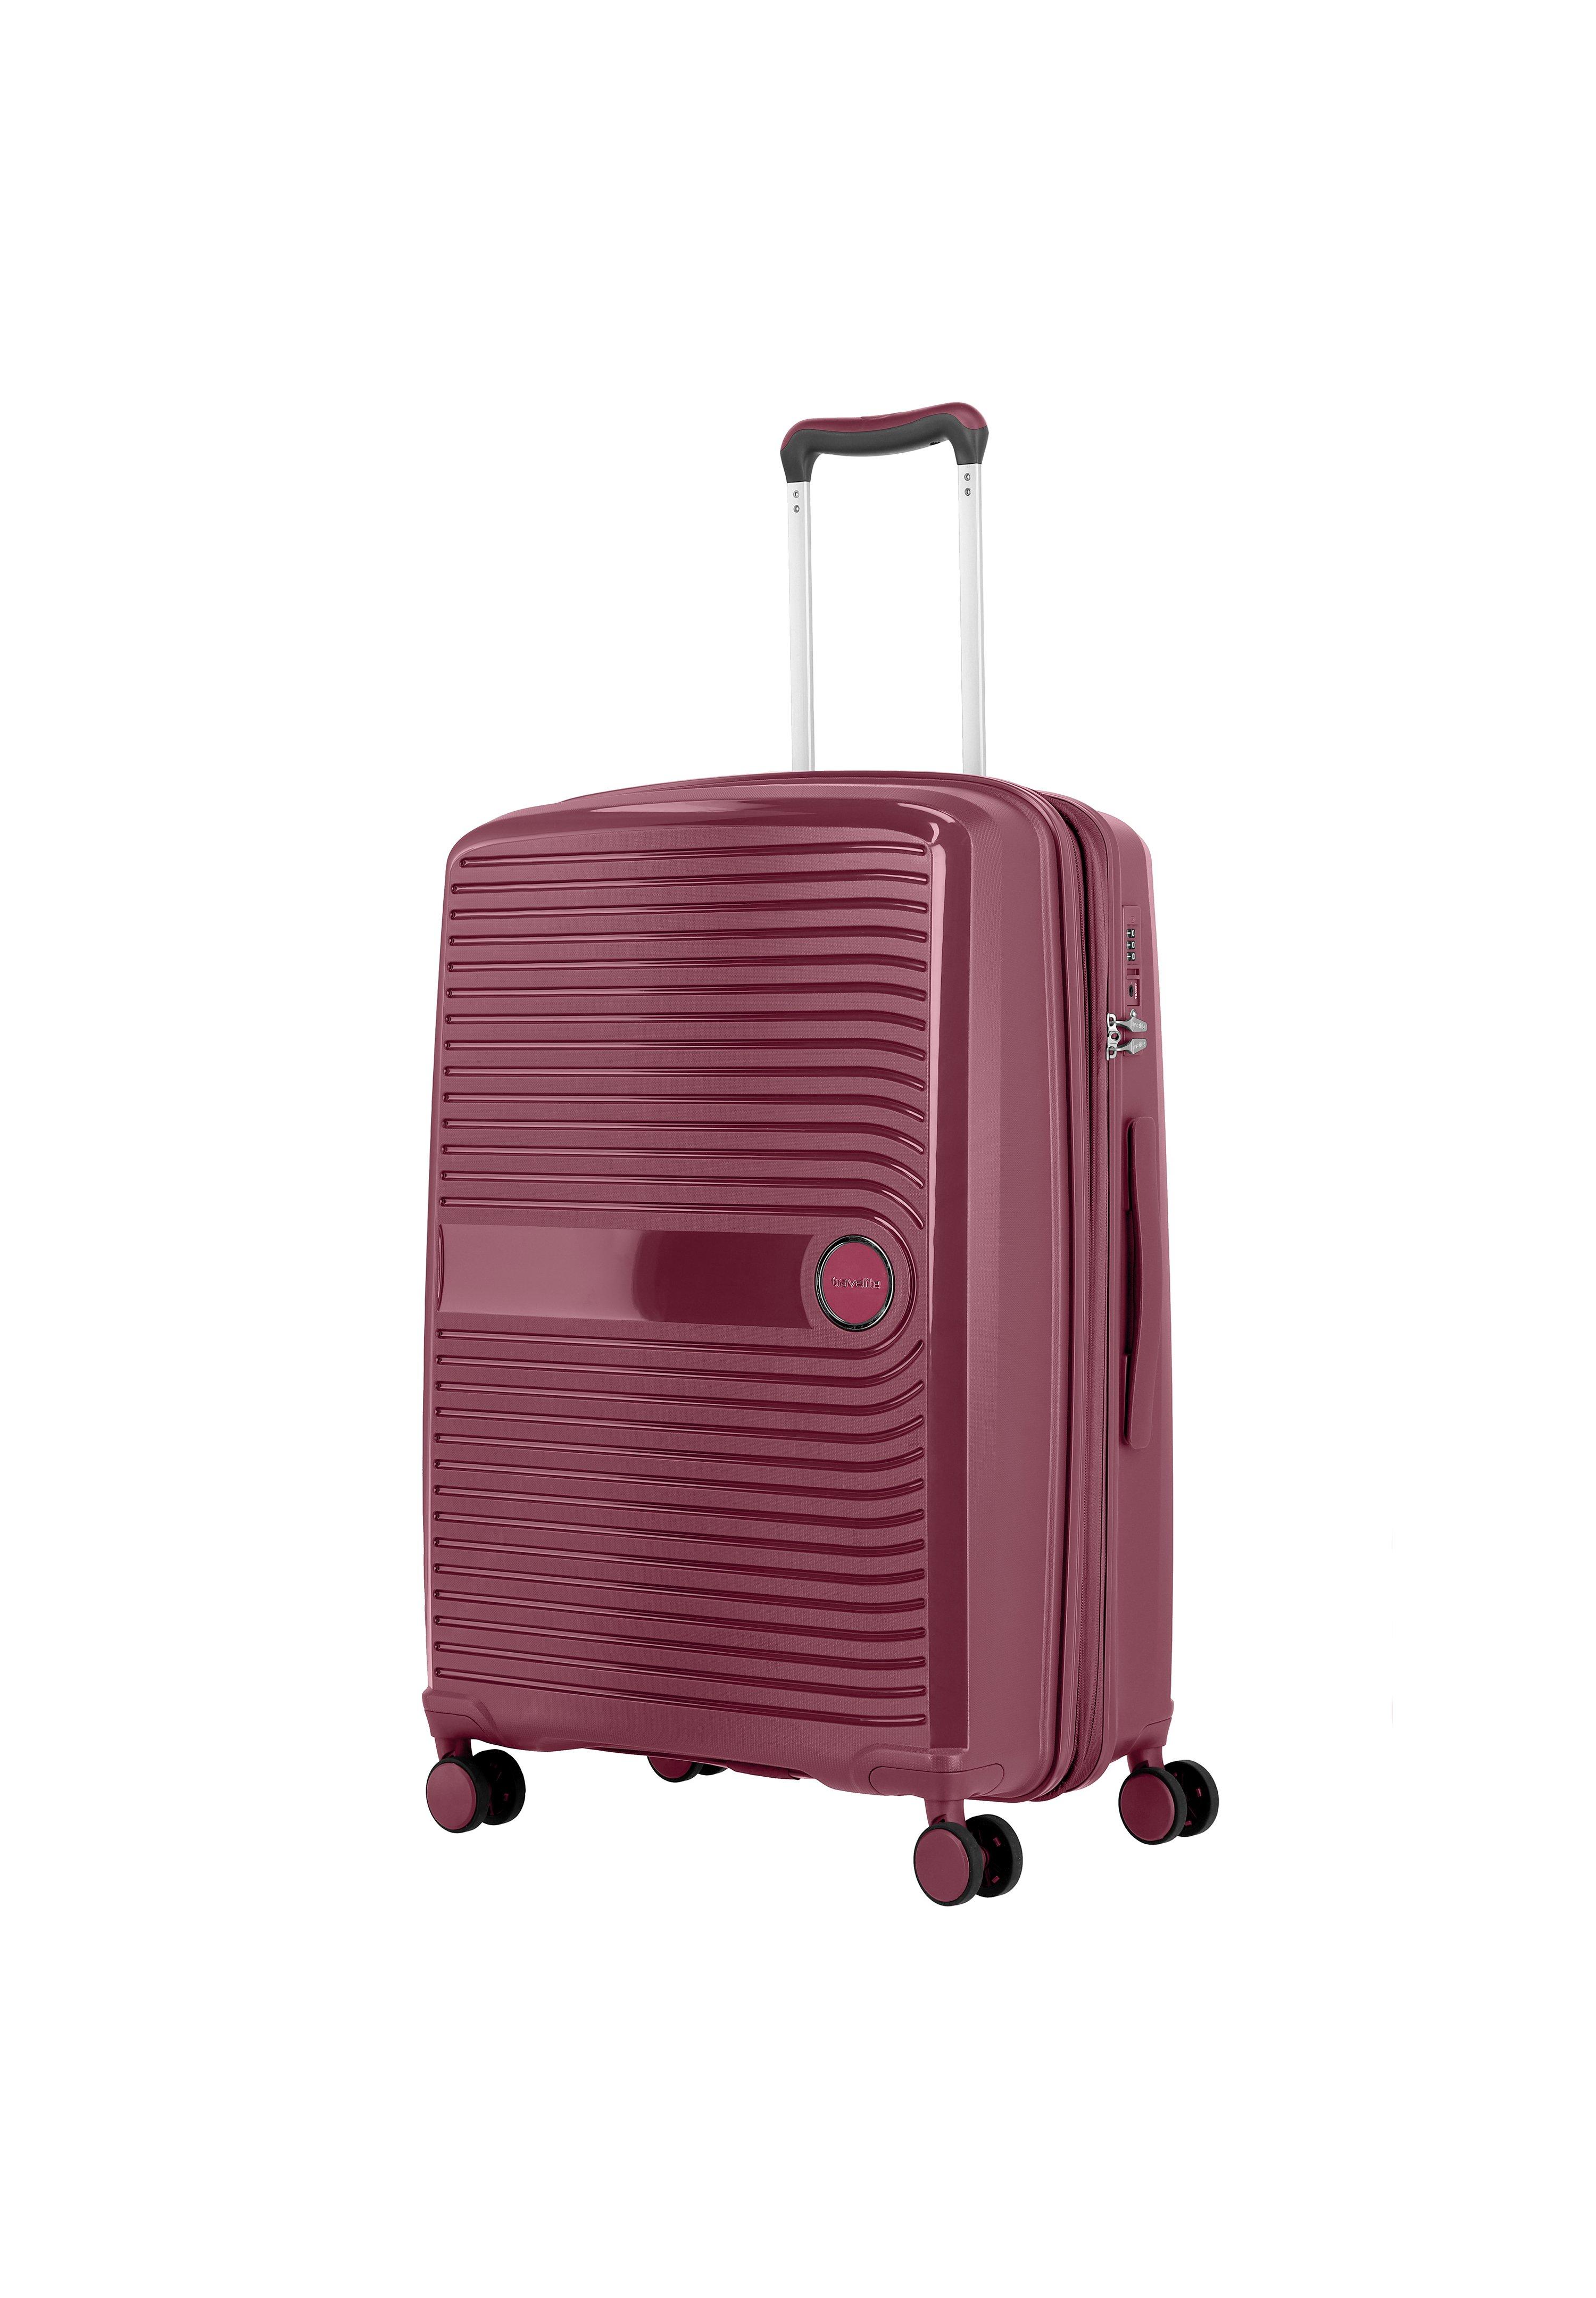 Travelite 3tlg - Set Di Valigie Red HlaulrT